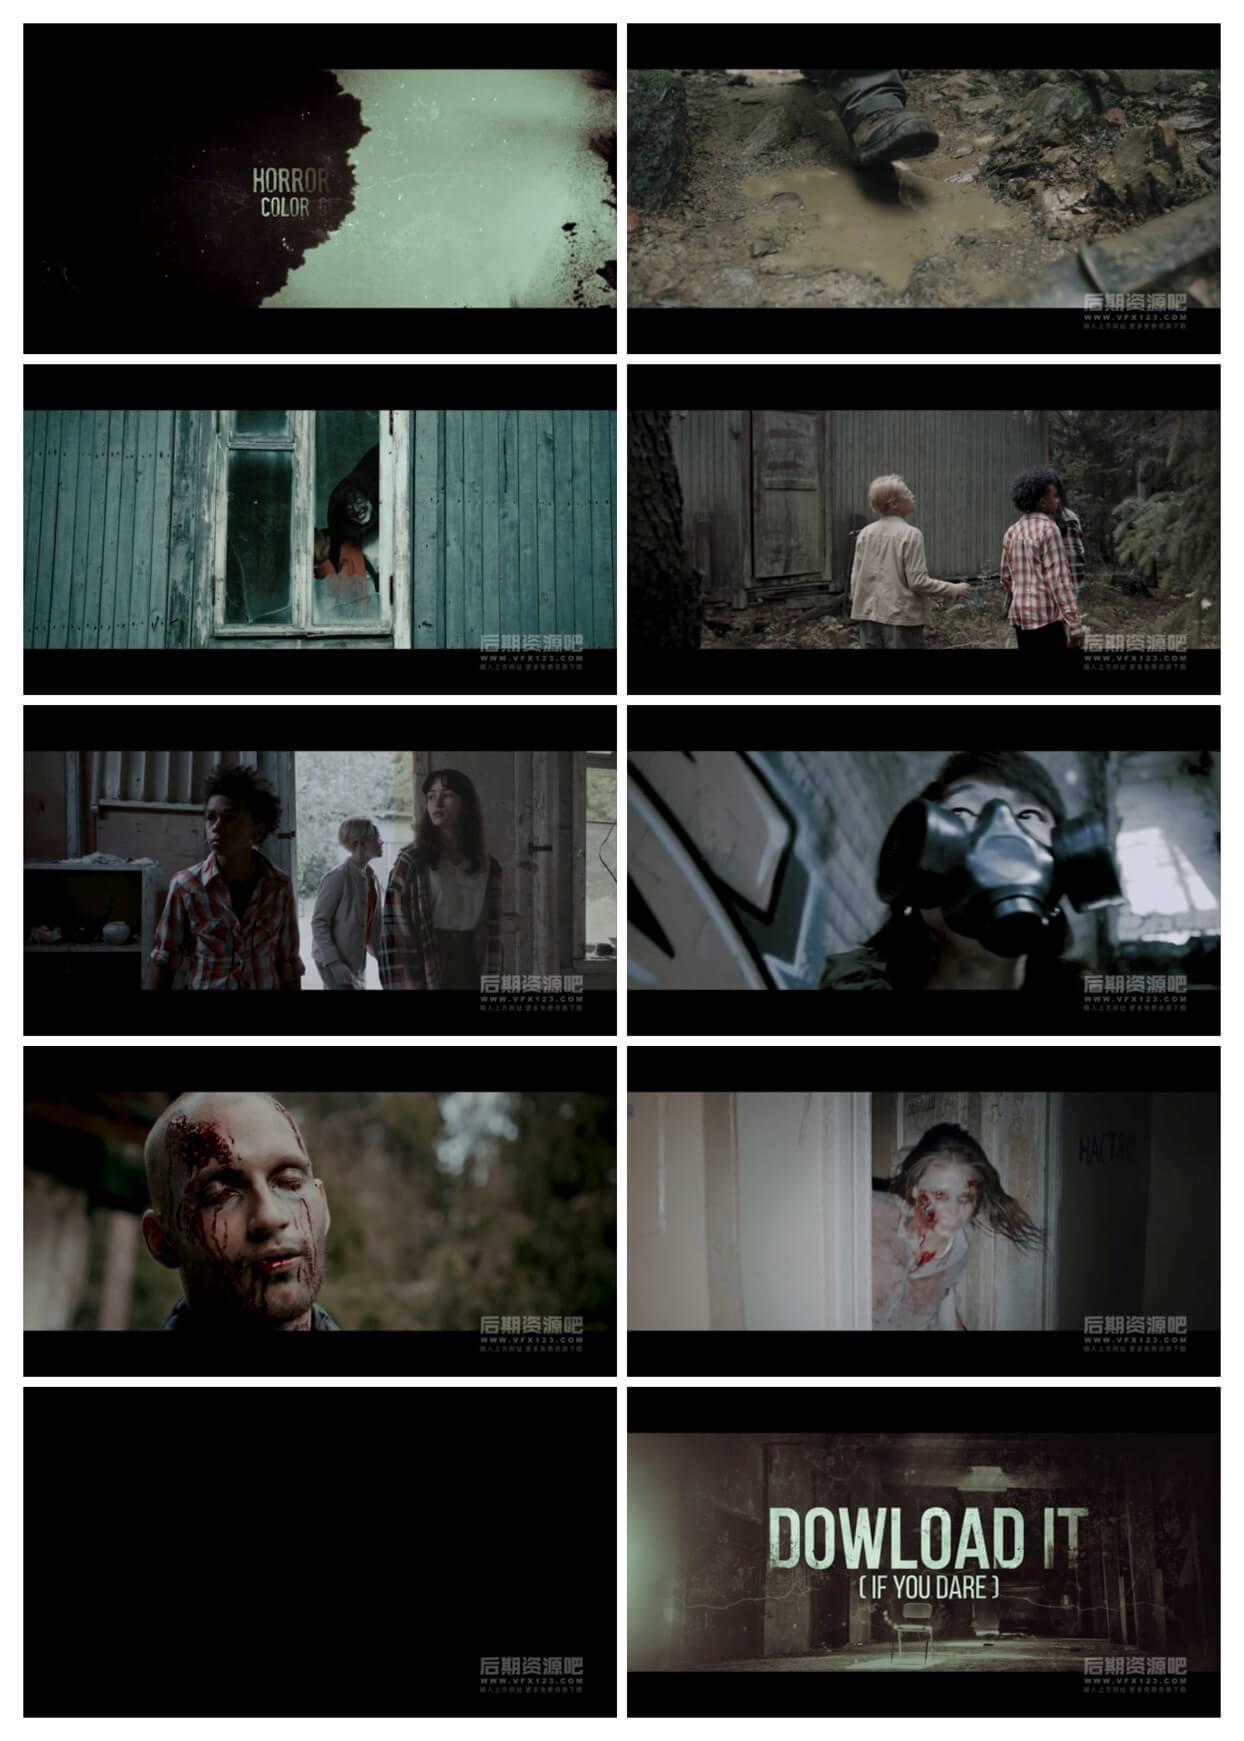 LUTs预设 30组恐怖电影颜色分级调色预设 Horror Film Color Grades